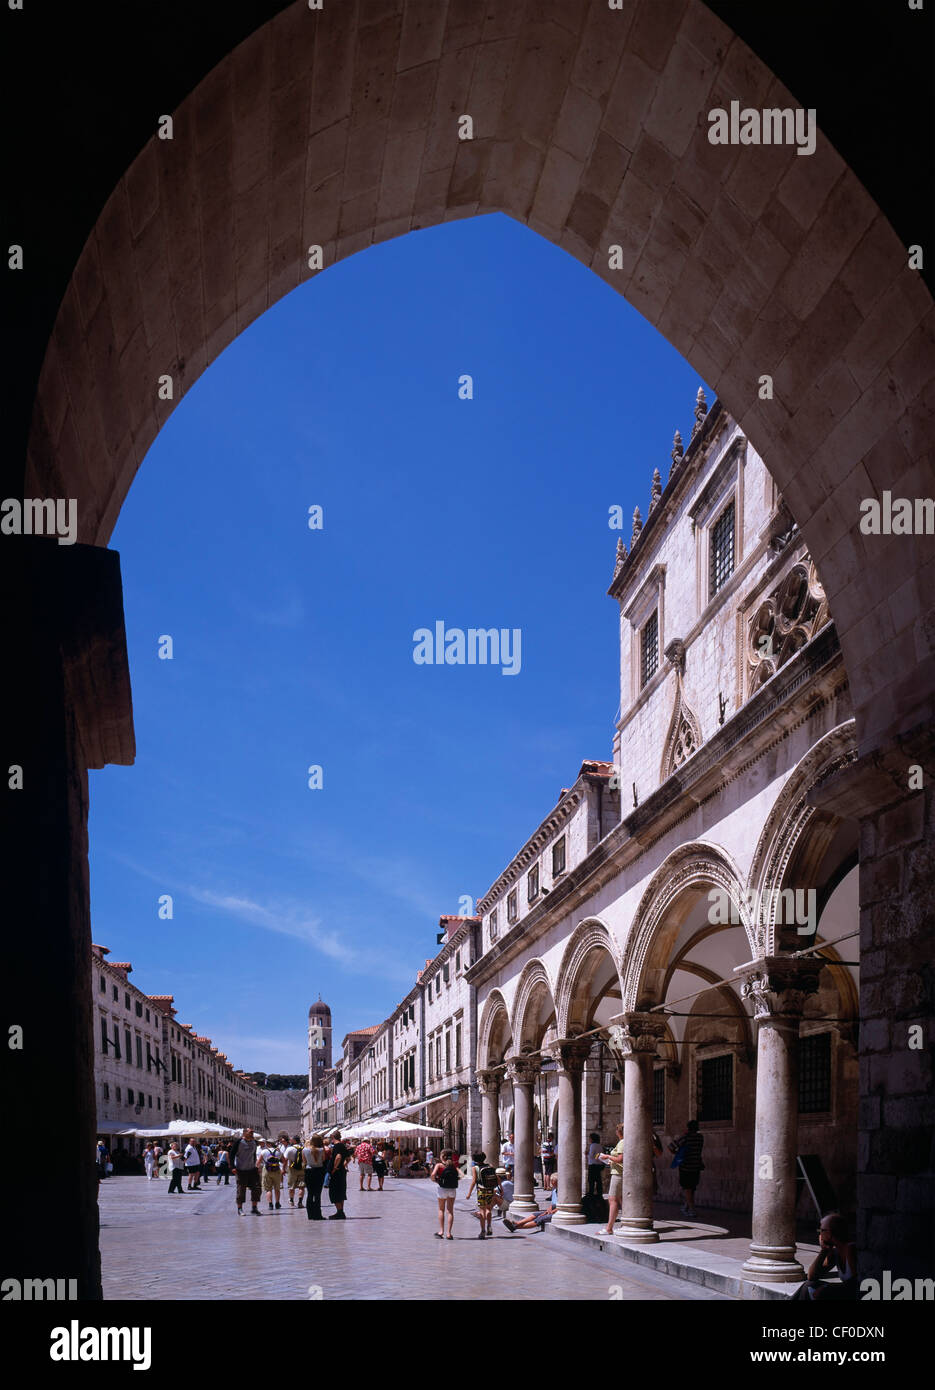 Sponza Palace and the Placa (Stradun), Dubrovnik, Dalmatia, Croatia. A UNESCO Cultural World Heritage Site. - Stock Image